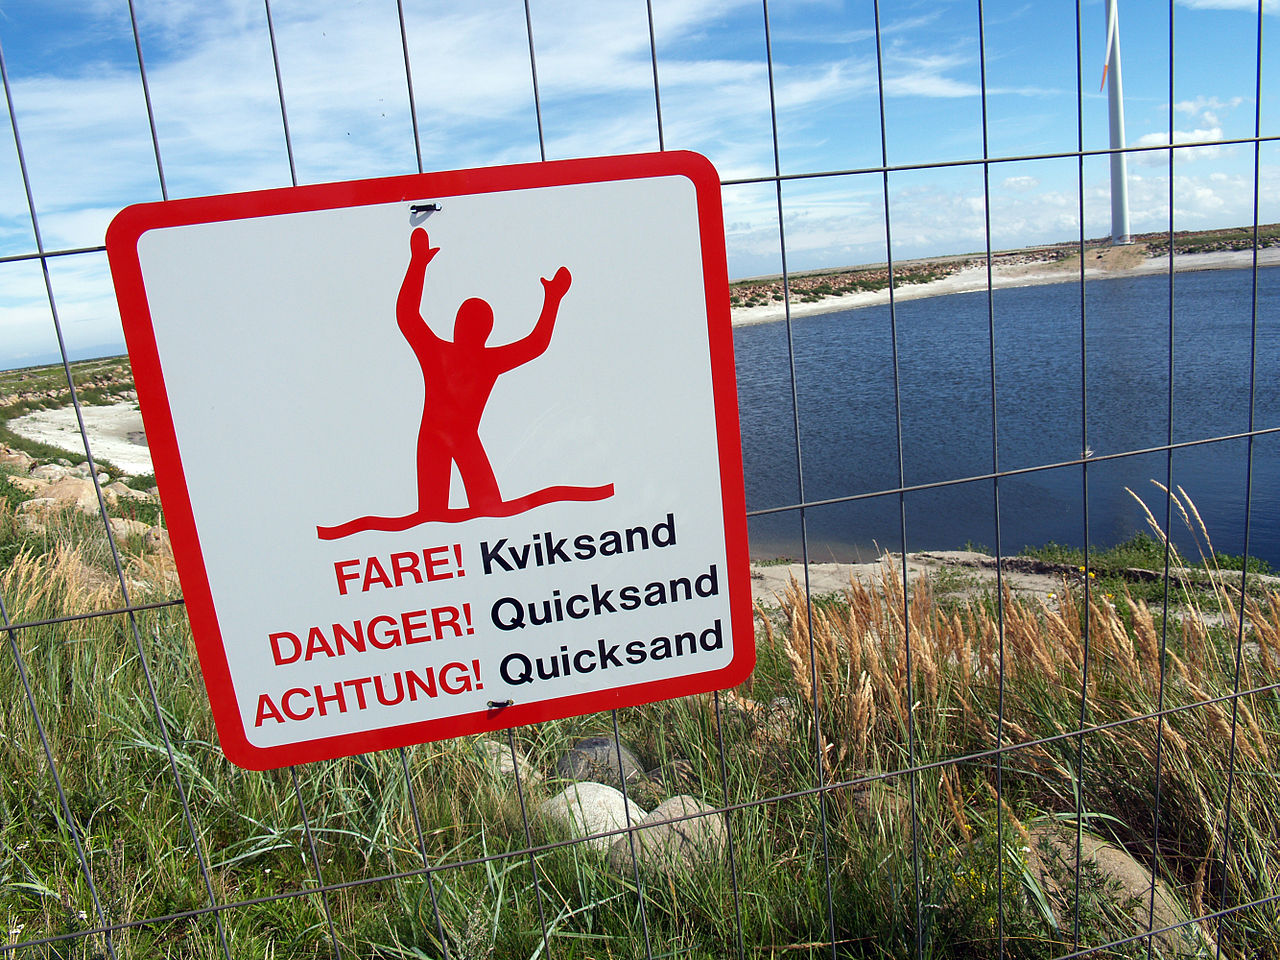 http://upload.wikimedia.org/wikipedia/commons/thumb/5/5c/Quicksand-warning-sign-denmark-2010.jpg/1280px-Quicksand-warning-sign-denmark-2010.jpg